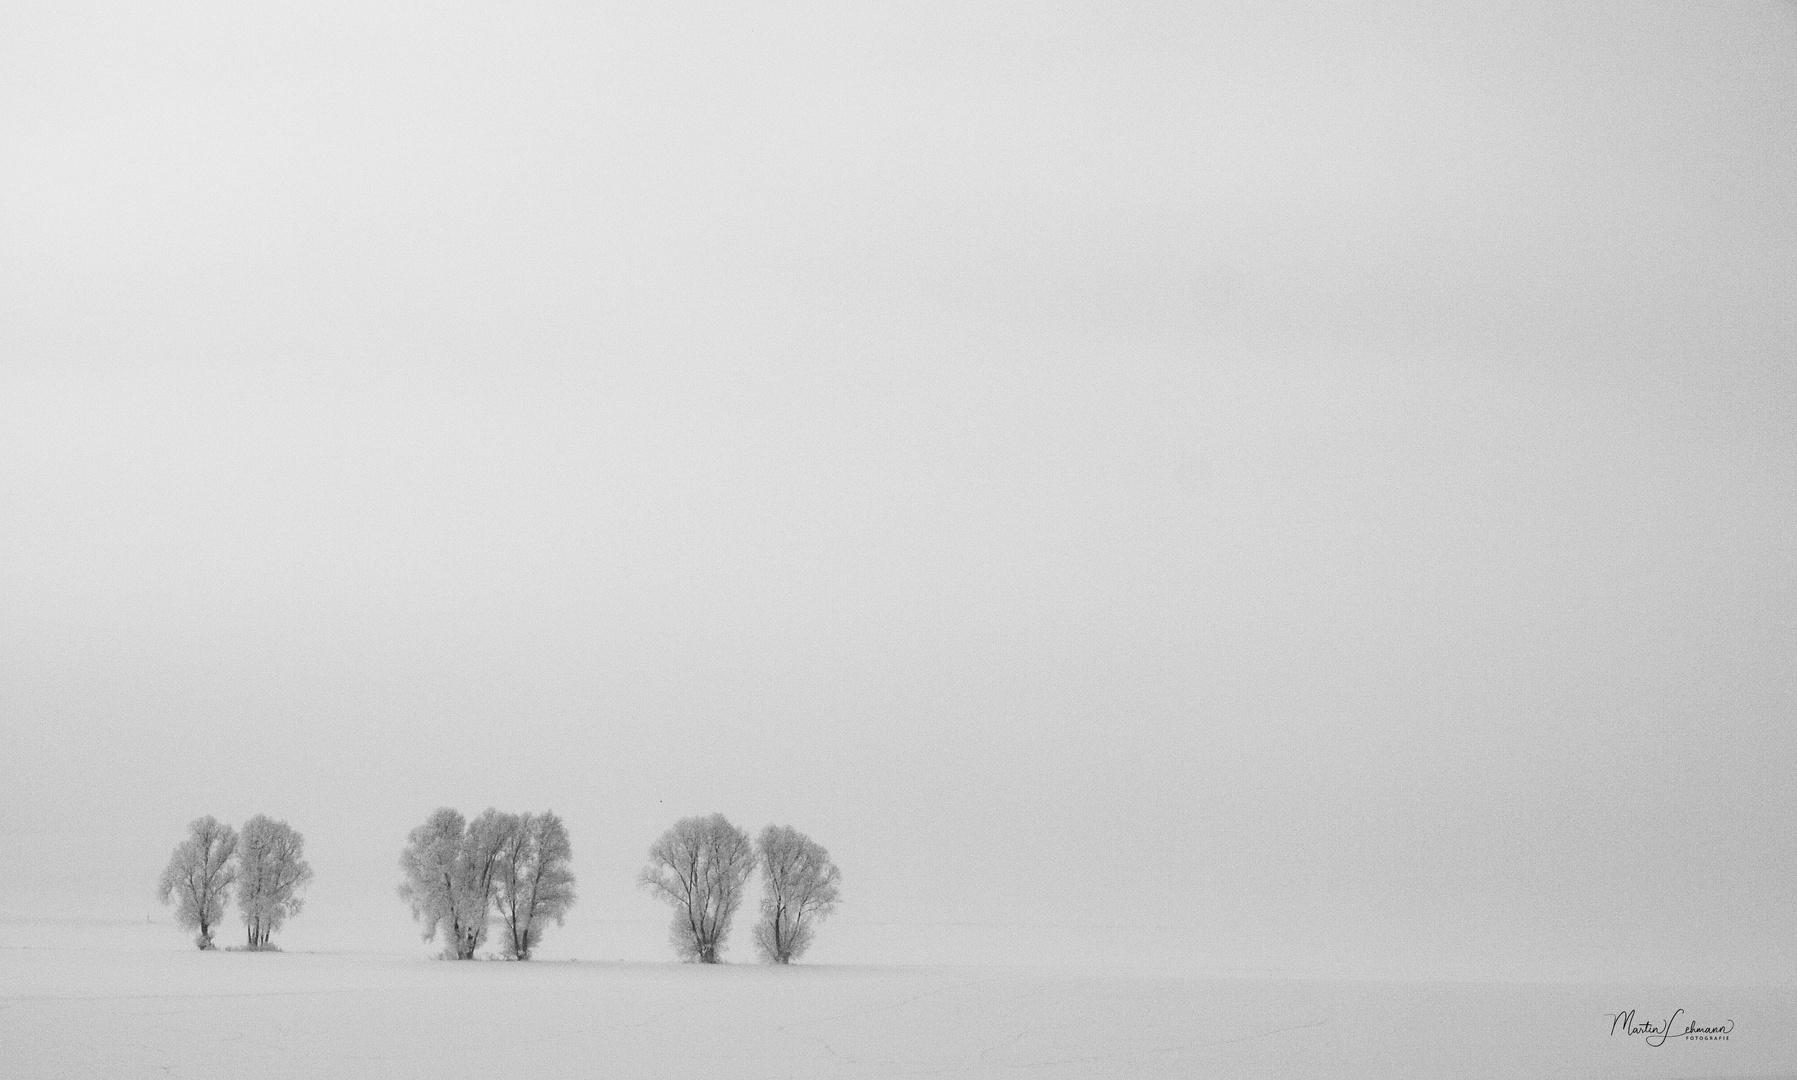 Winterlandschaft bei Esbeck